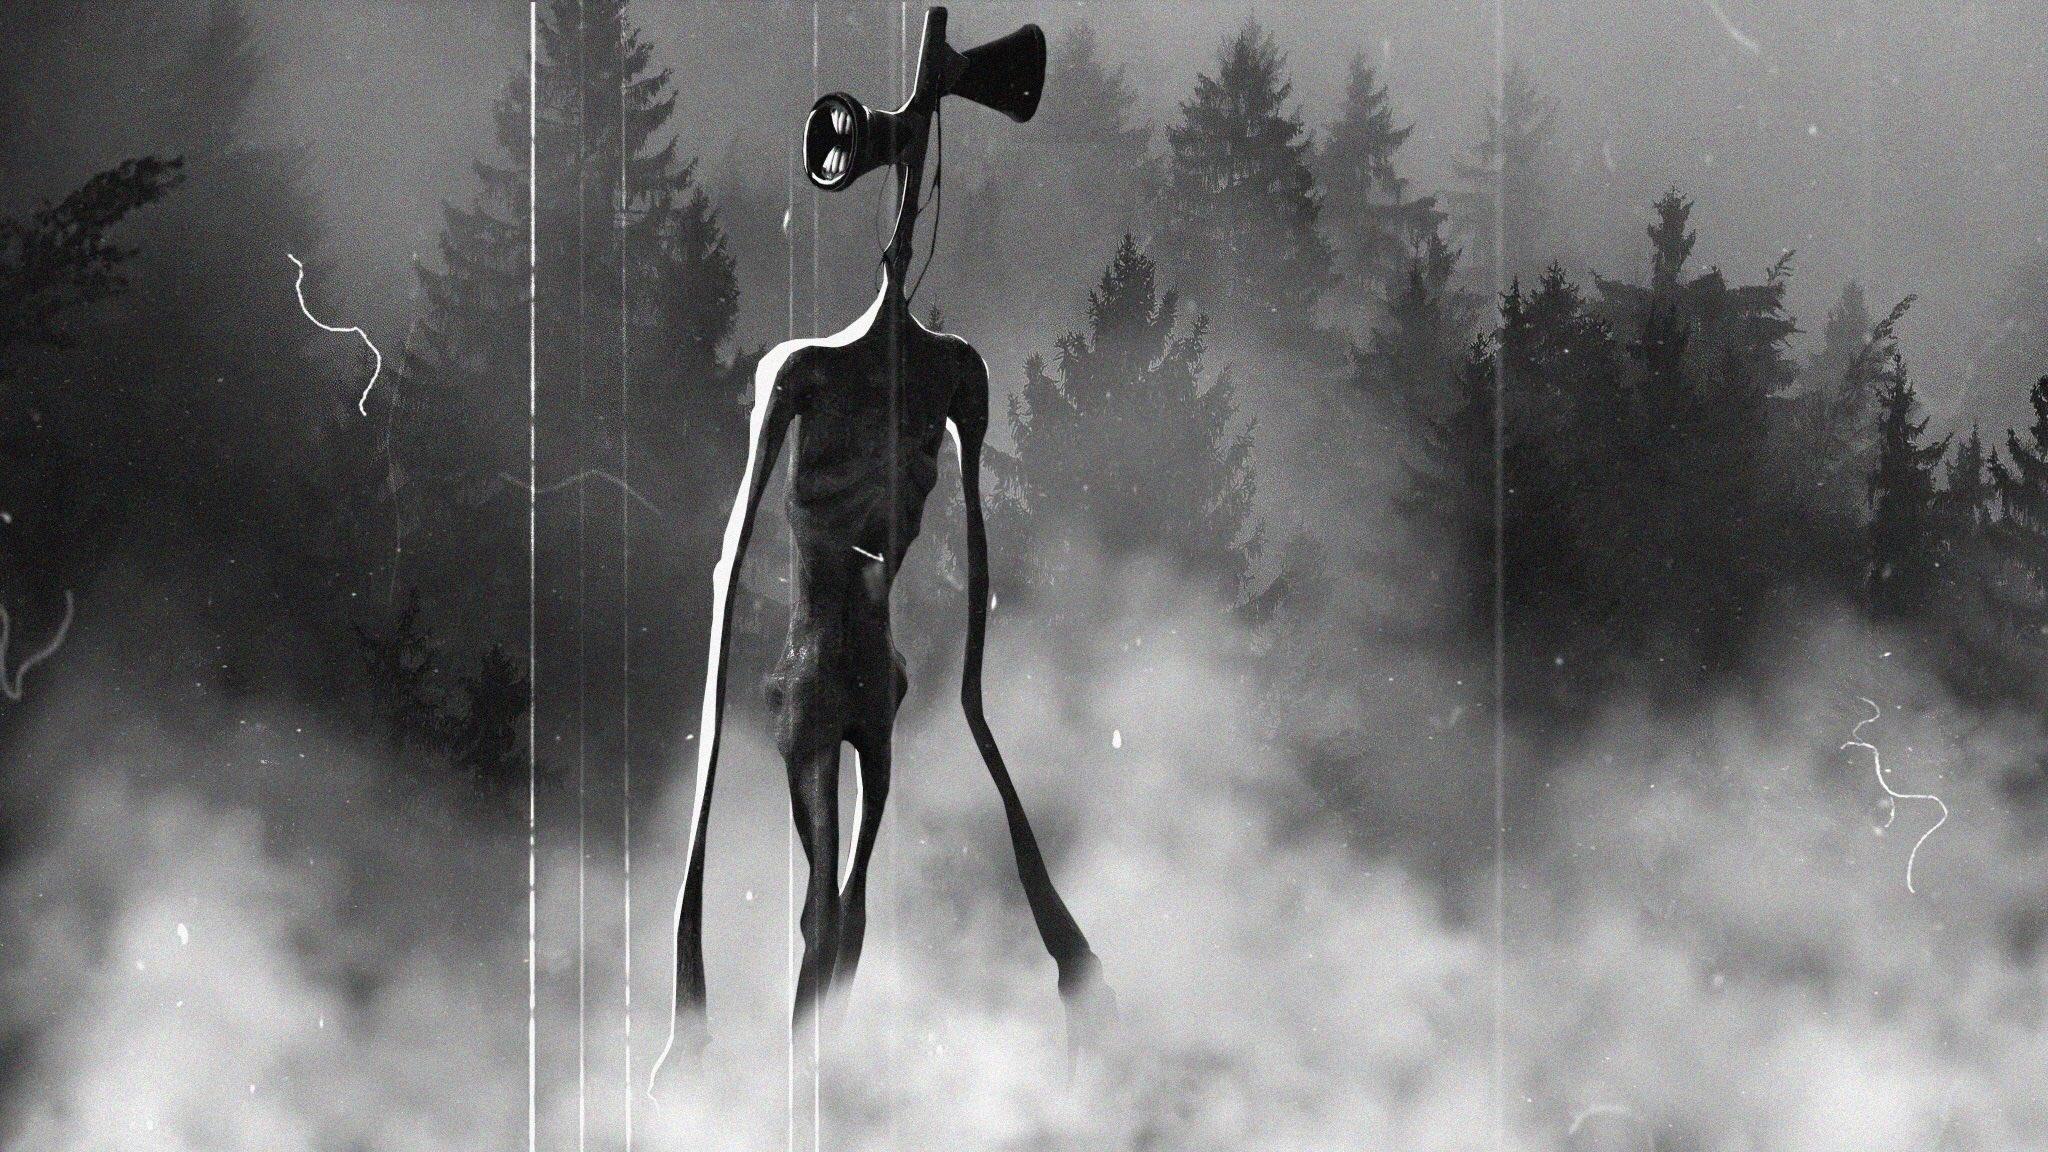 General 2048x1152 Siren Head surreal artwork monochrome